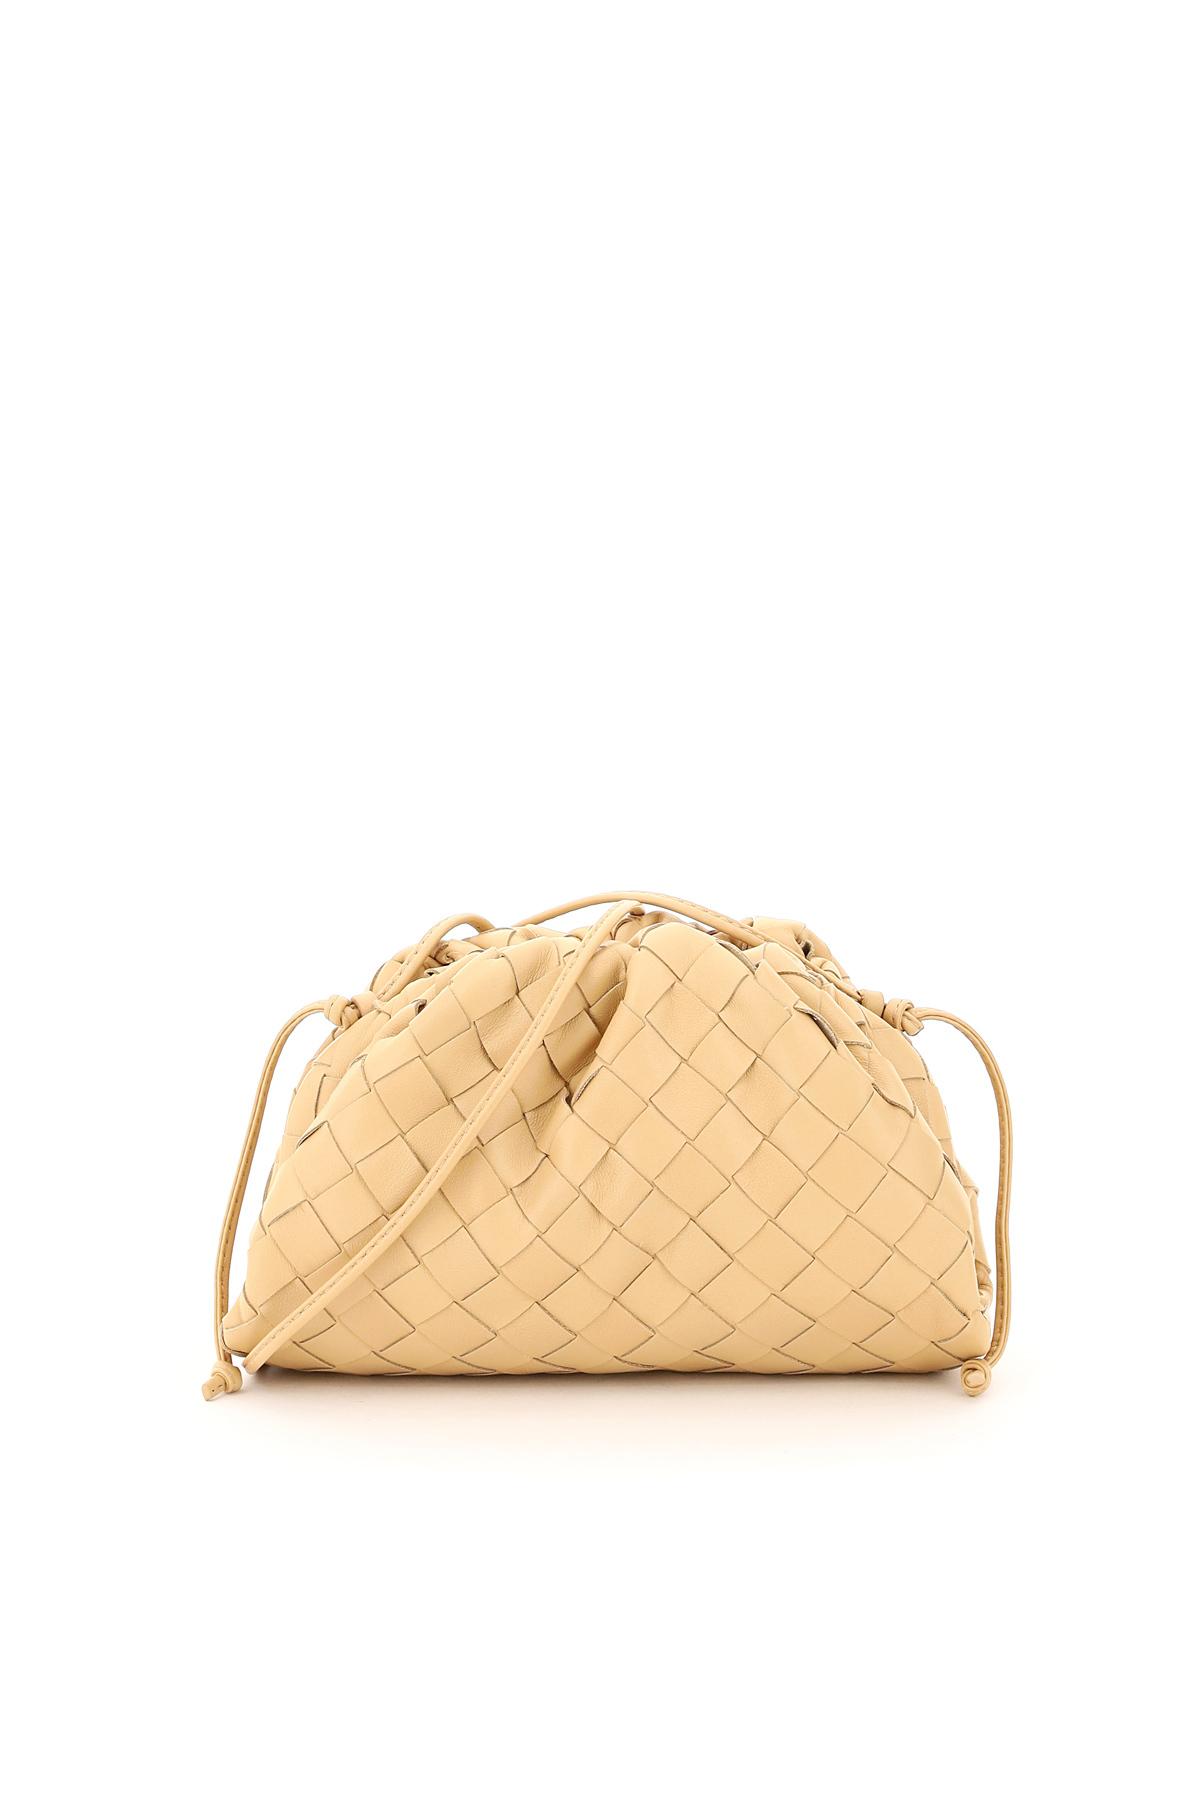 BOTTEGA VENETA THE POUCH 20 OS Beige Leather